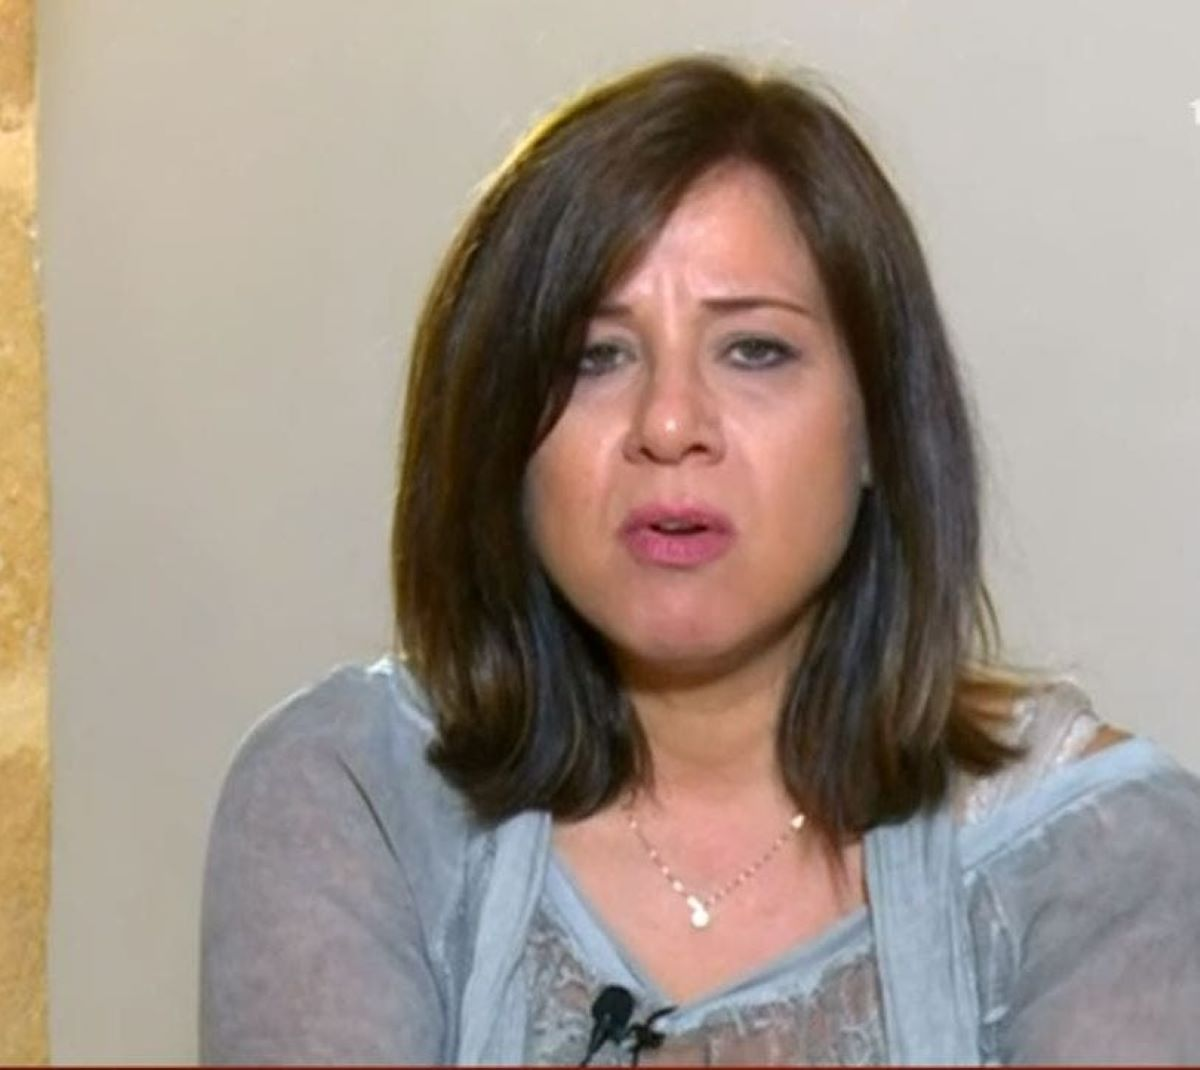 Piera Maggio Furia Quarto Grado Denise Pipitone Gianluigi Nuzzi